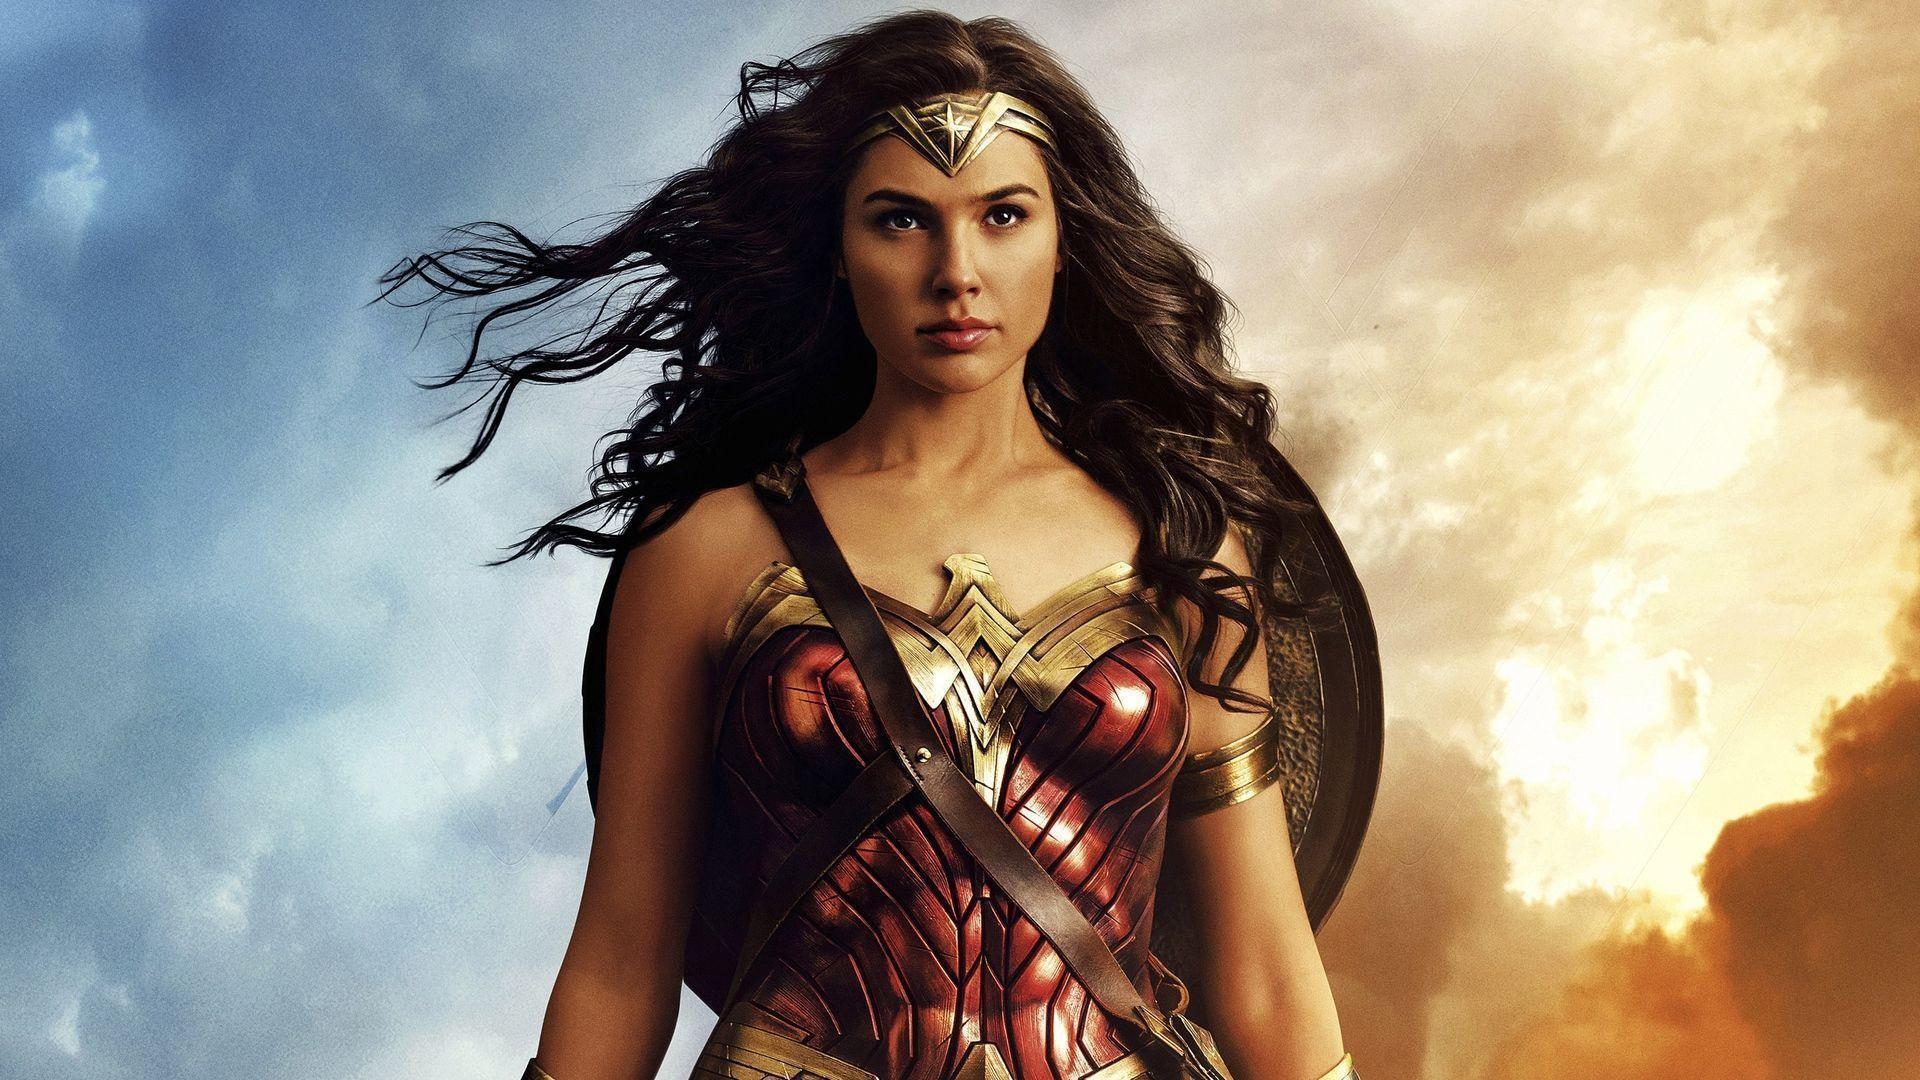 Wonder Woman Wallpaper (71+ images)